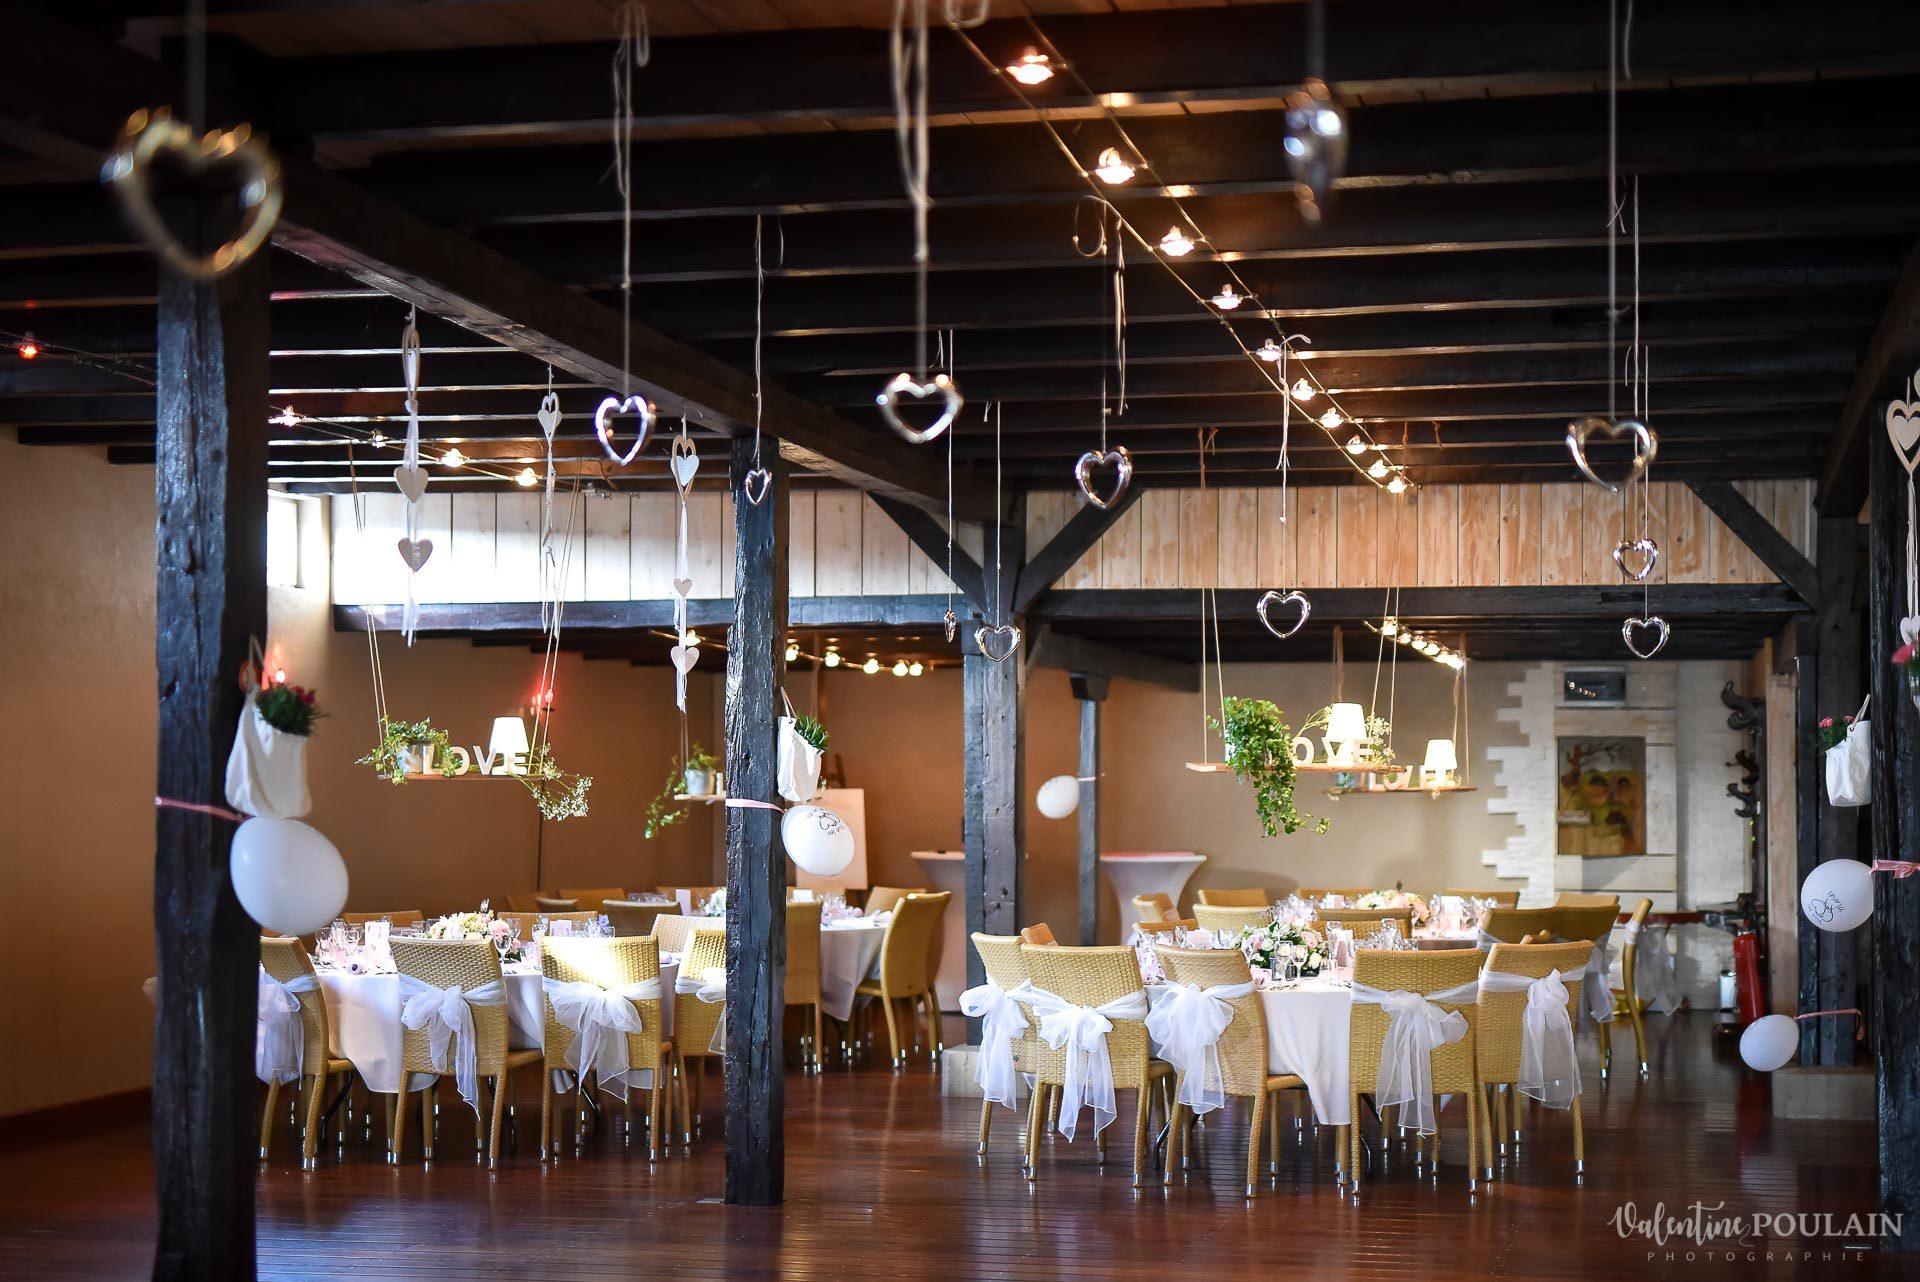 Mariage cool ferme weyerbach - Valentine Poulain espace